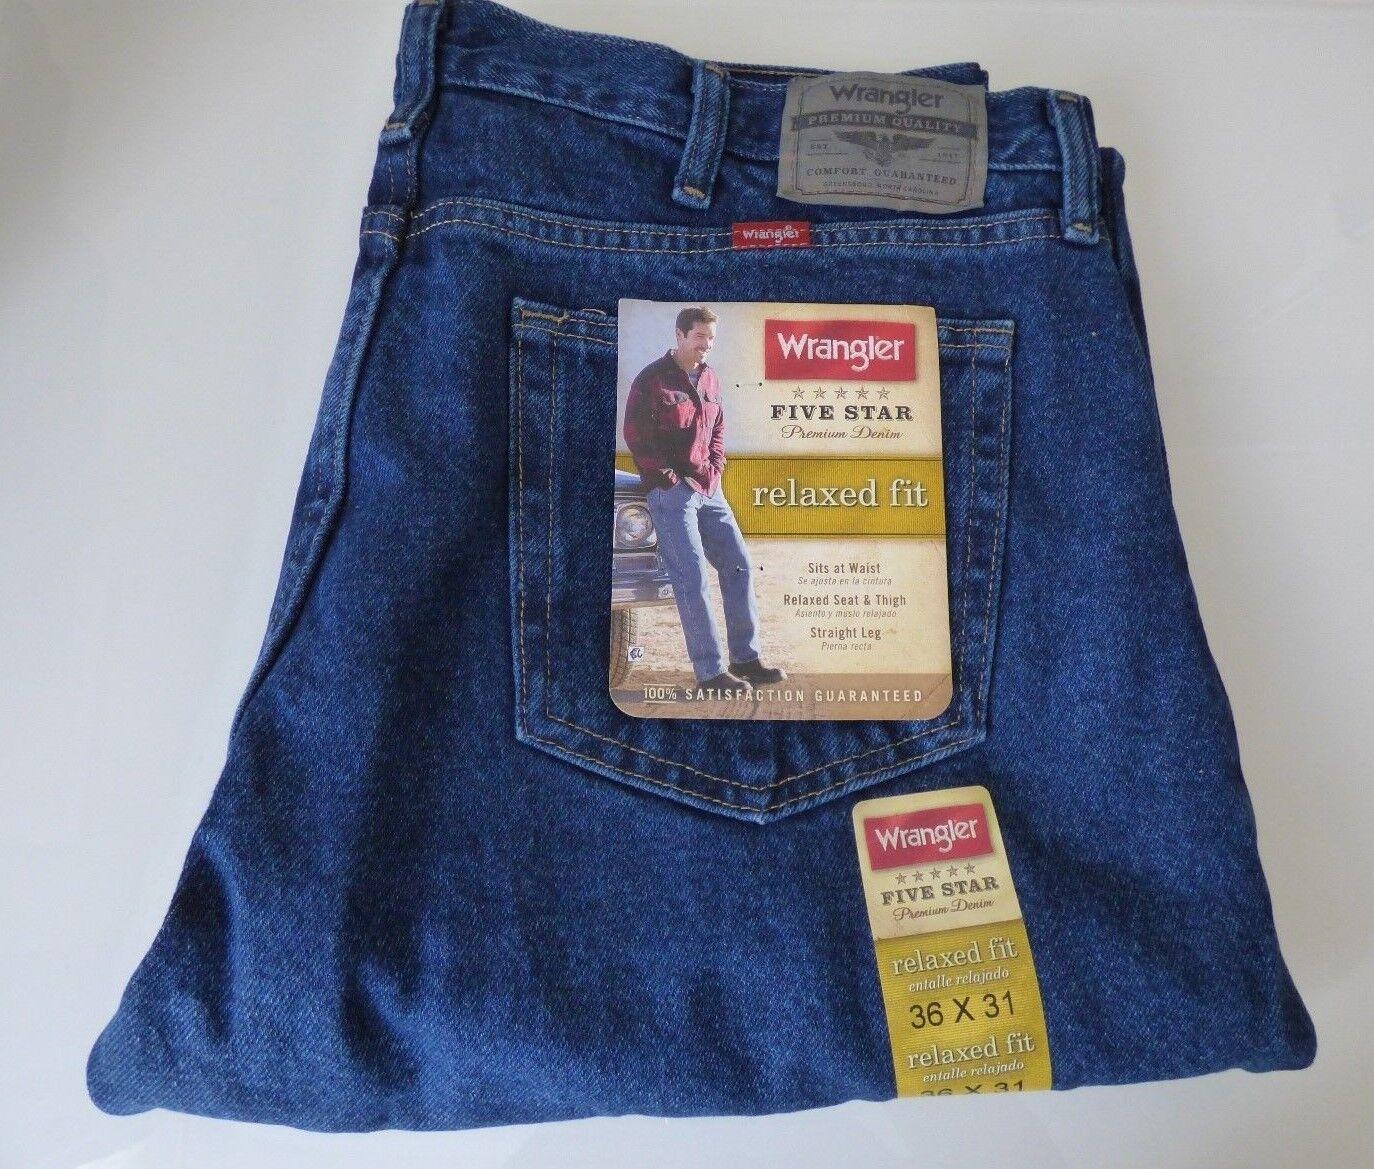 bfd9e5fd Mens Wrangler 5 Star Relaxed Fit Jeans Premium Denim · $29.99 · Jeans